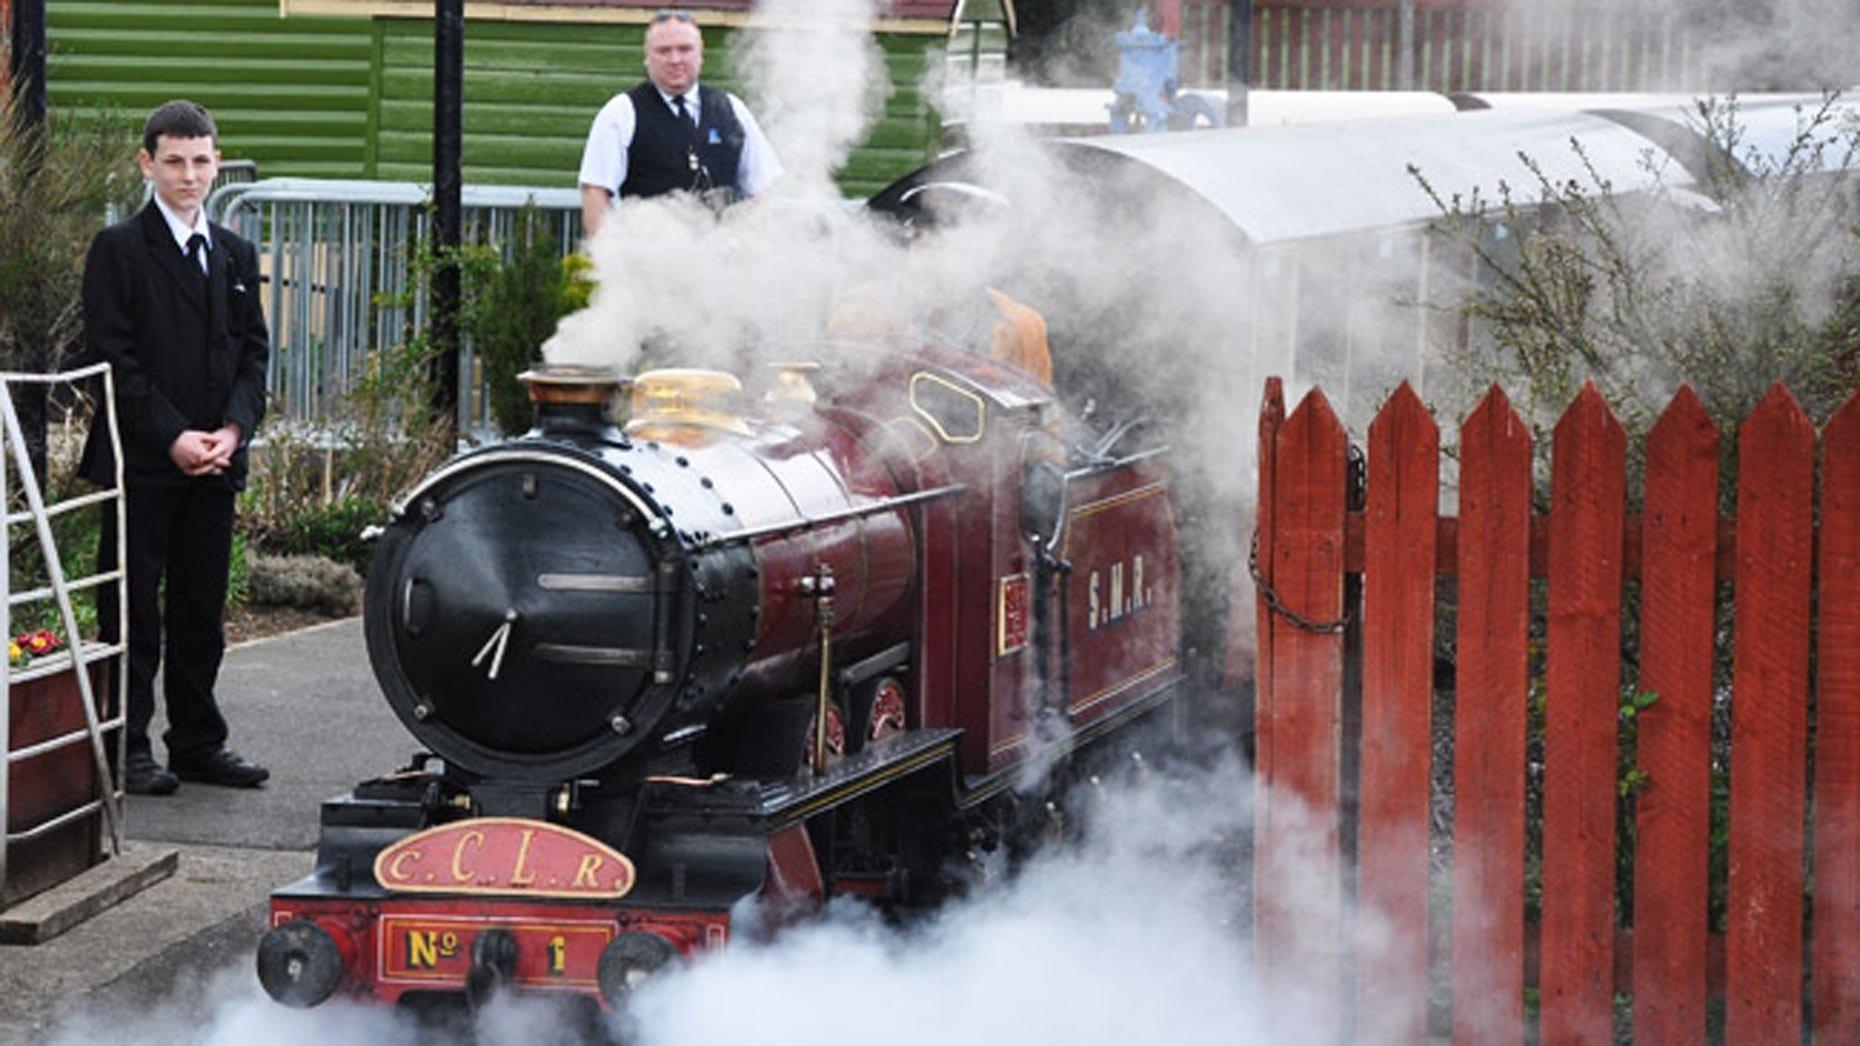 Photo: Cleethorpes Coast Light Railway